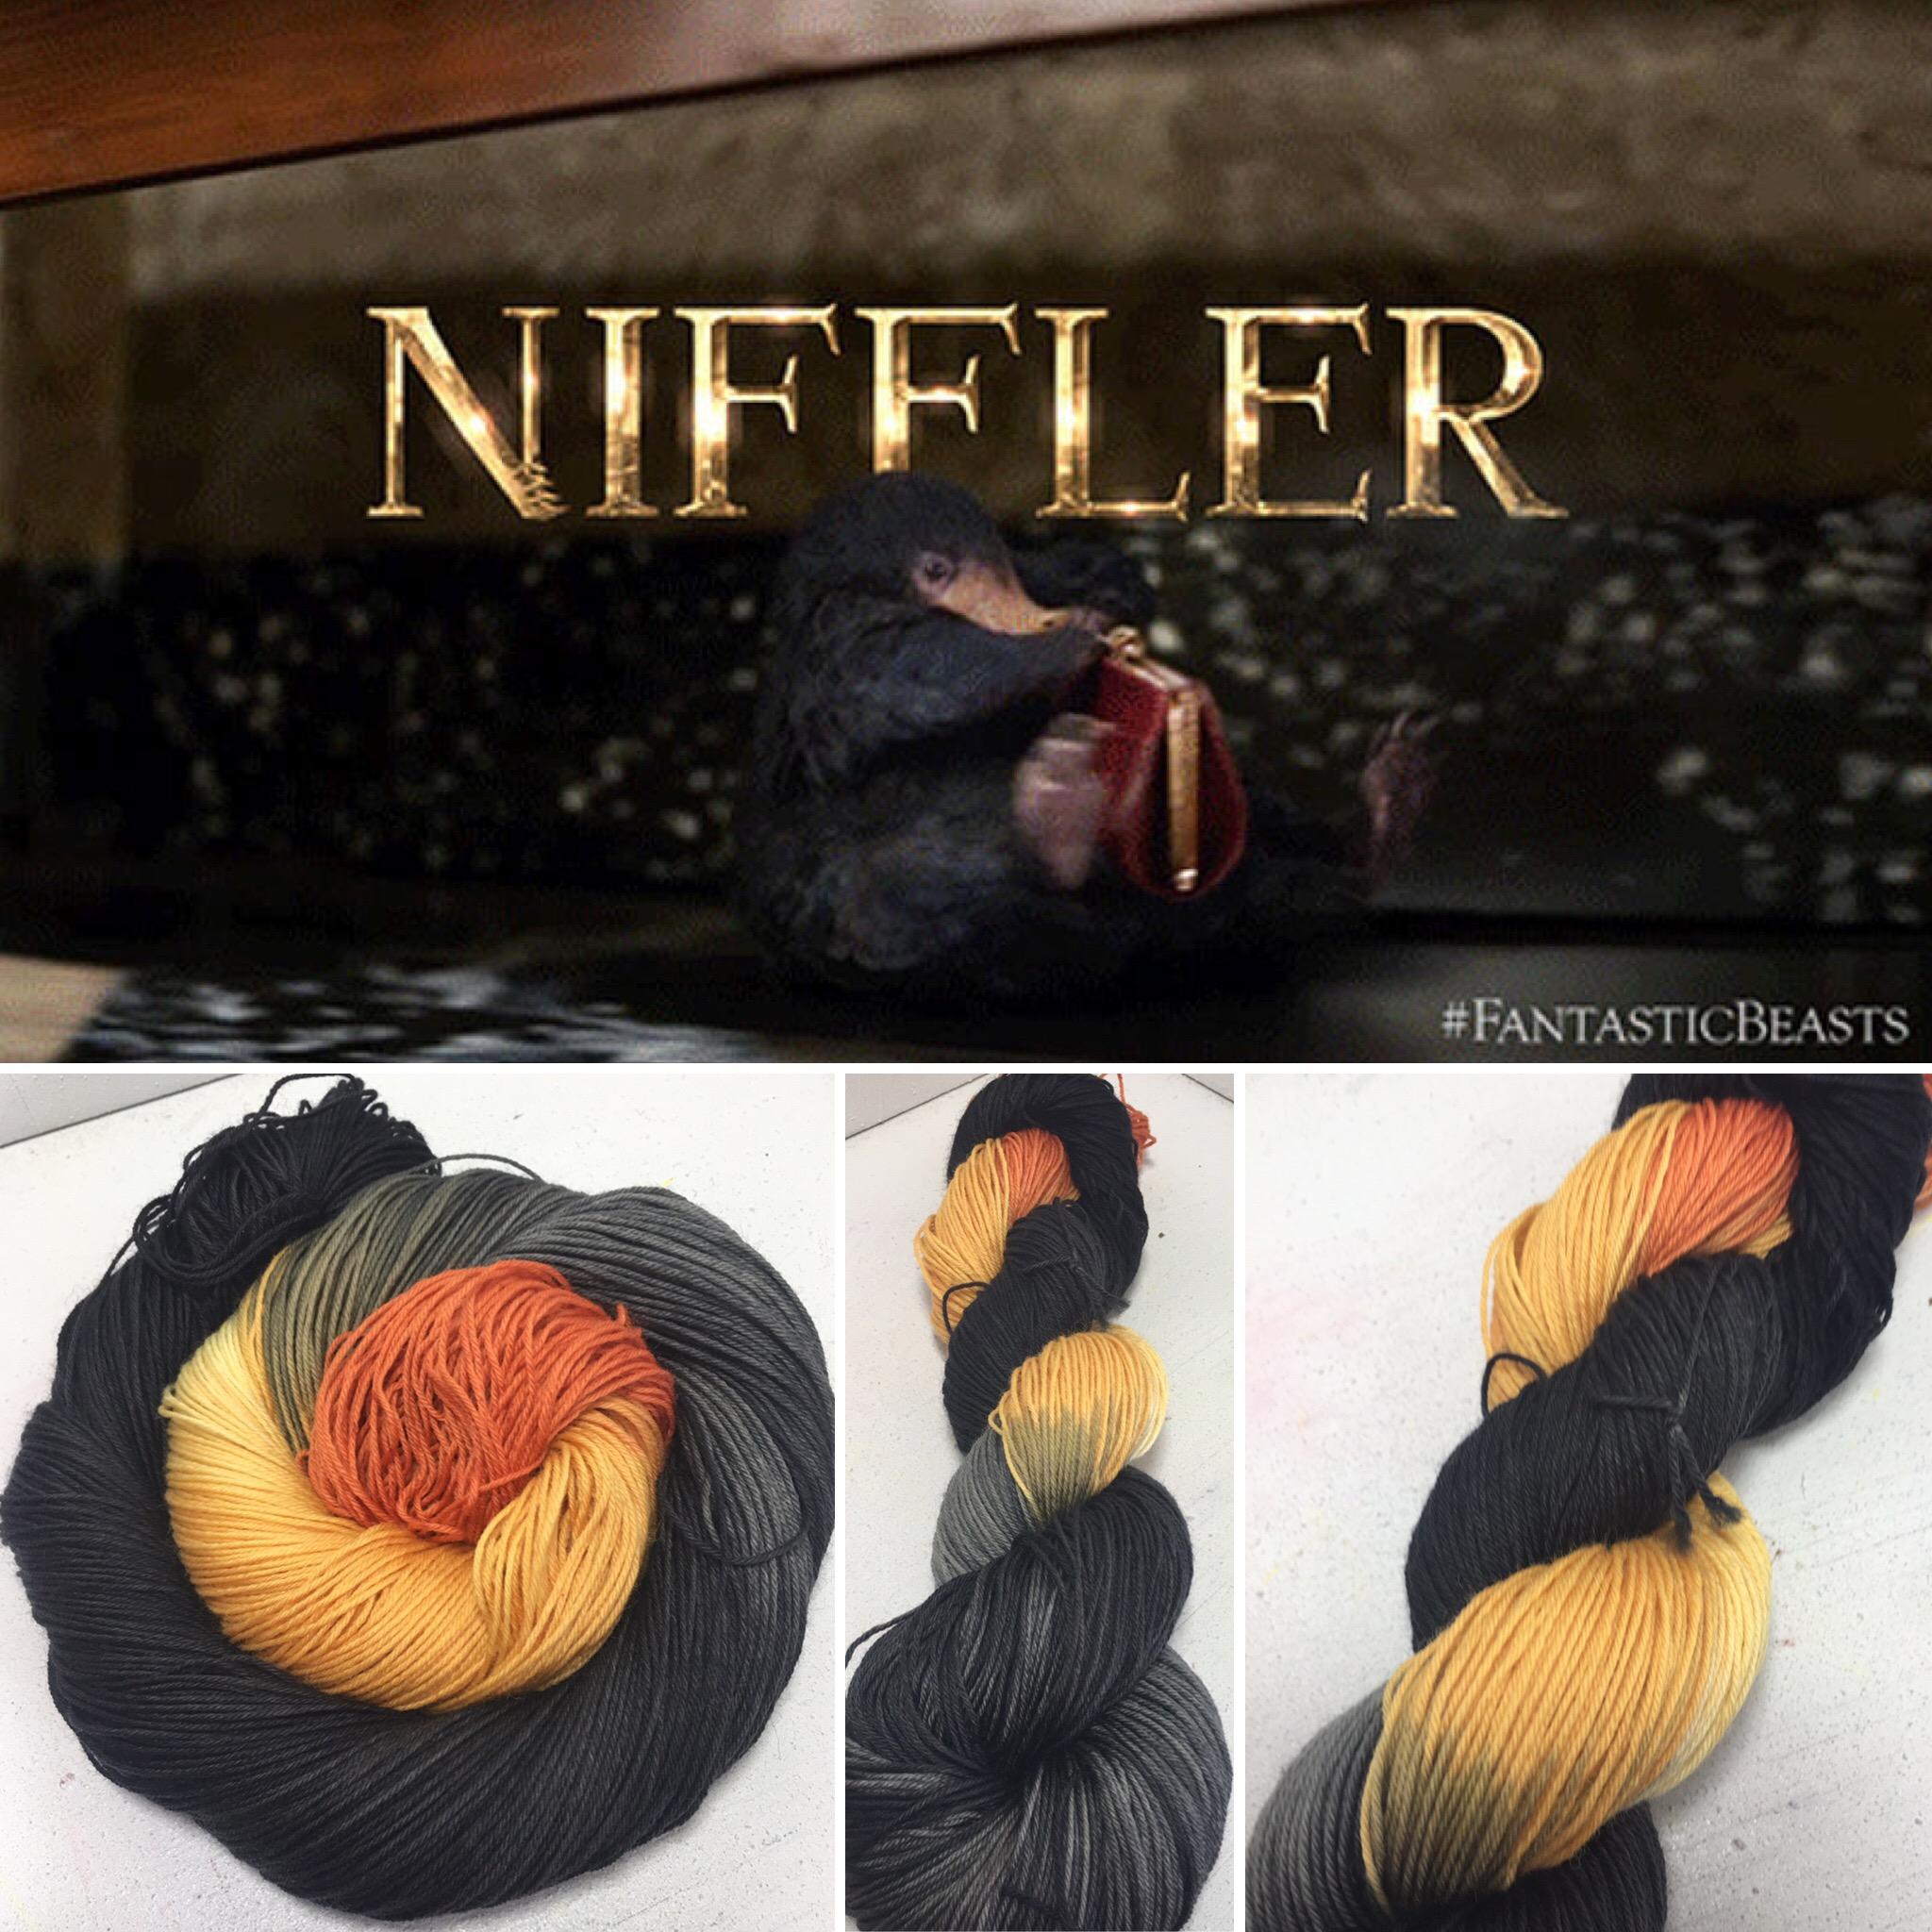 https://www.etsy.com/listing/478633616/niffler-100-superwash-merino-fingering